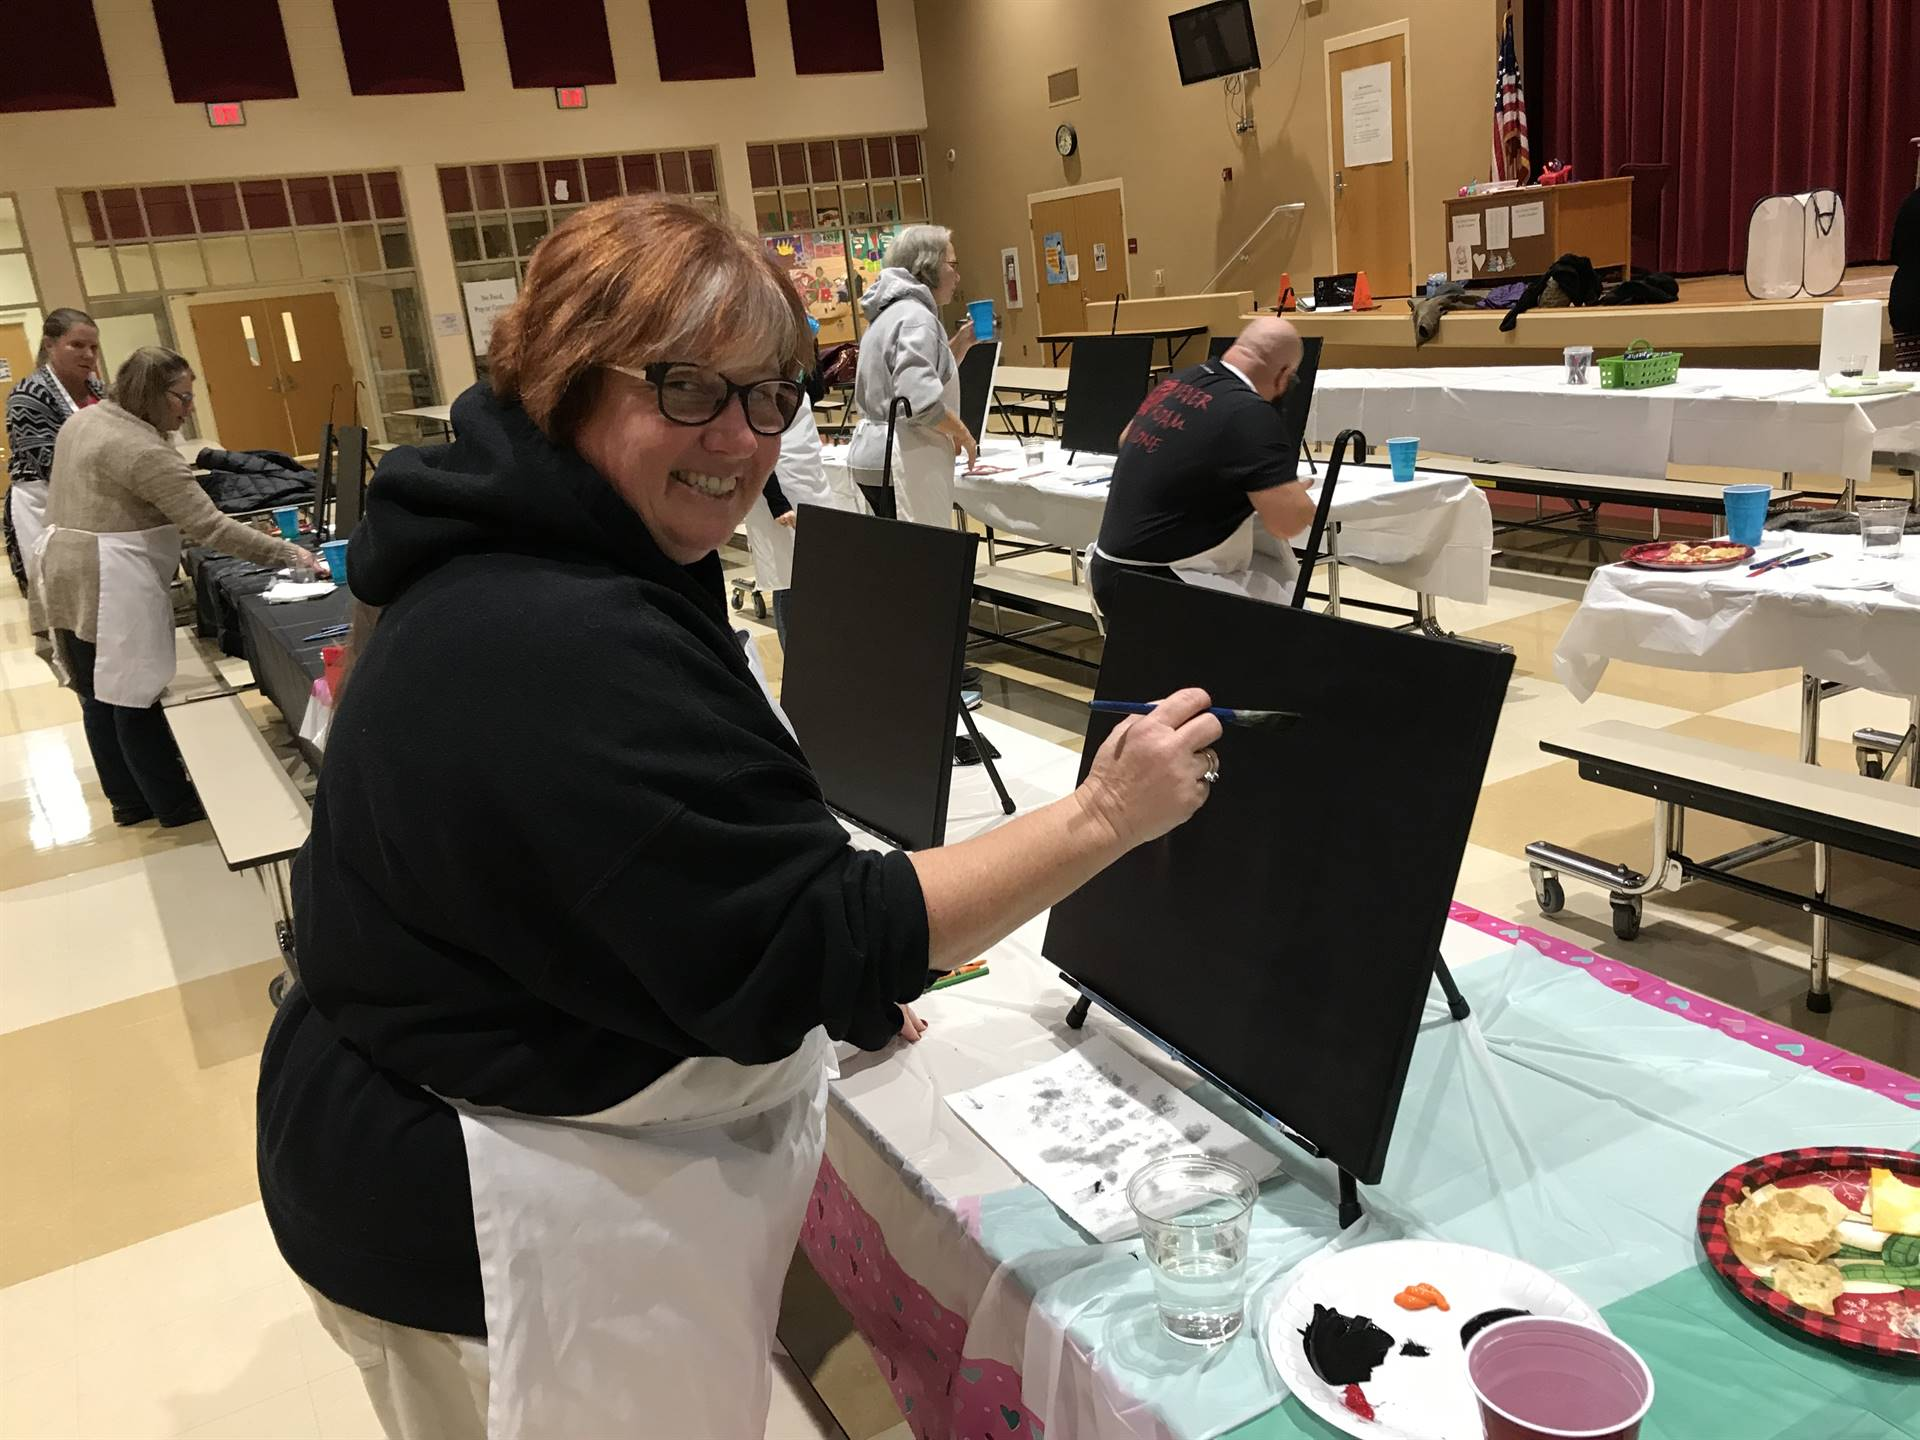 Arrow Parent Nation Teacher Painting